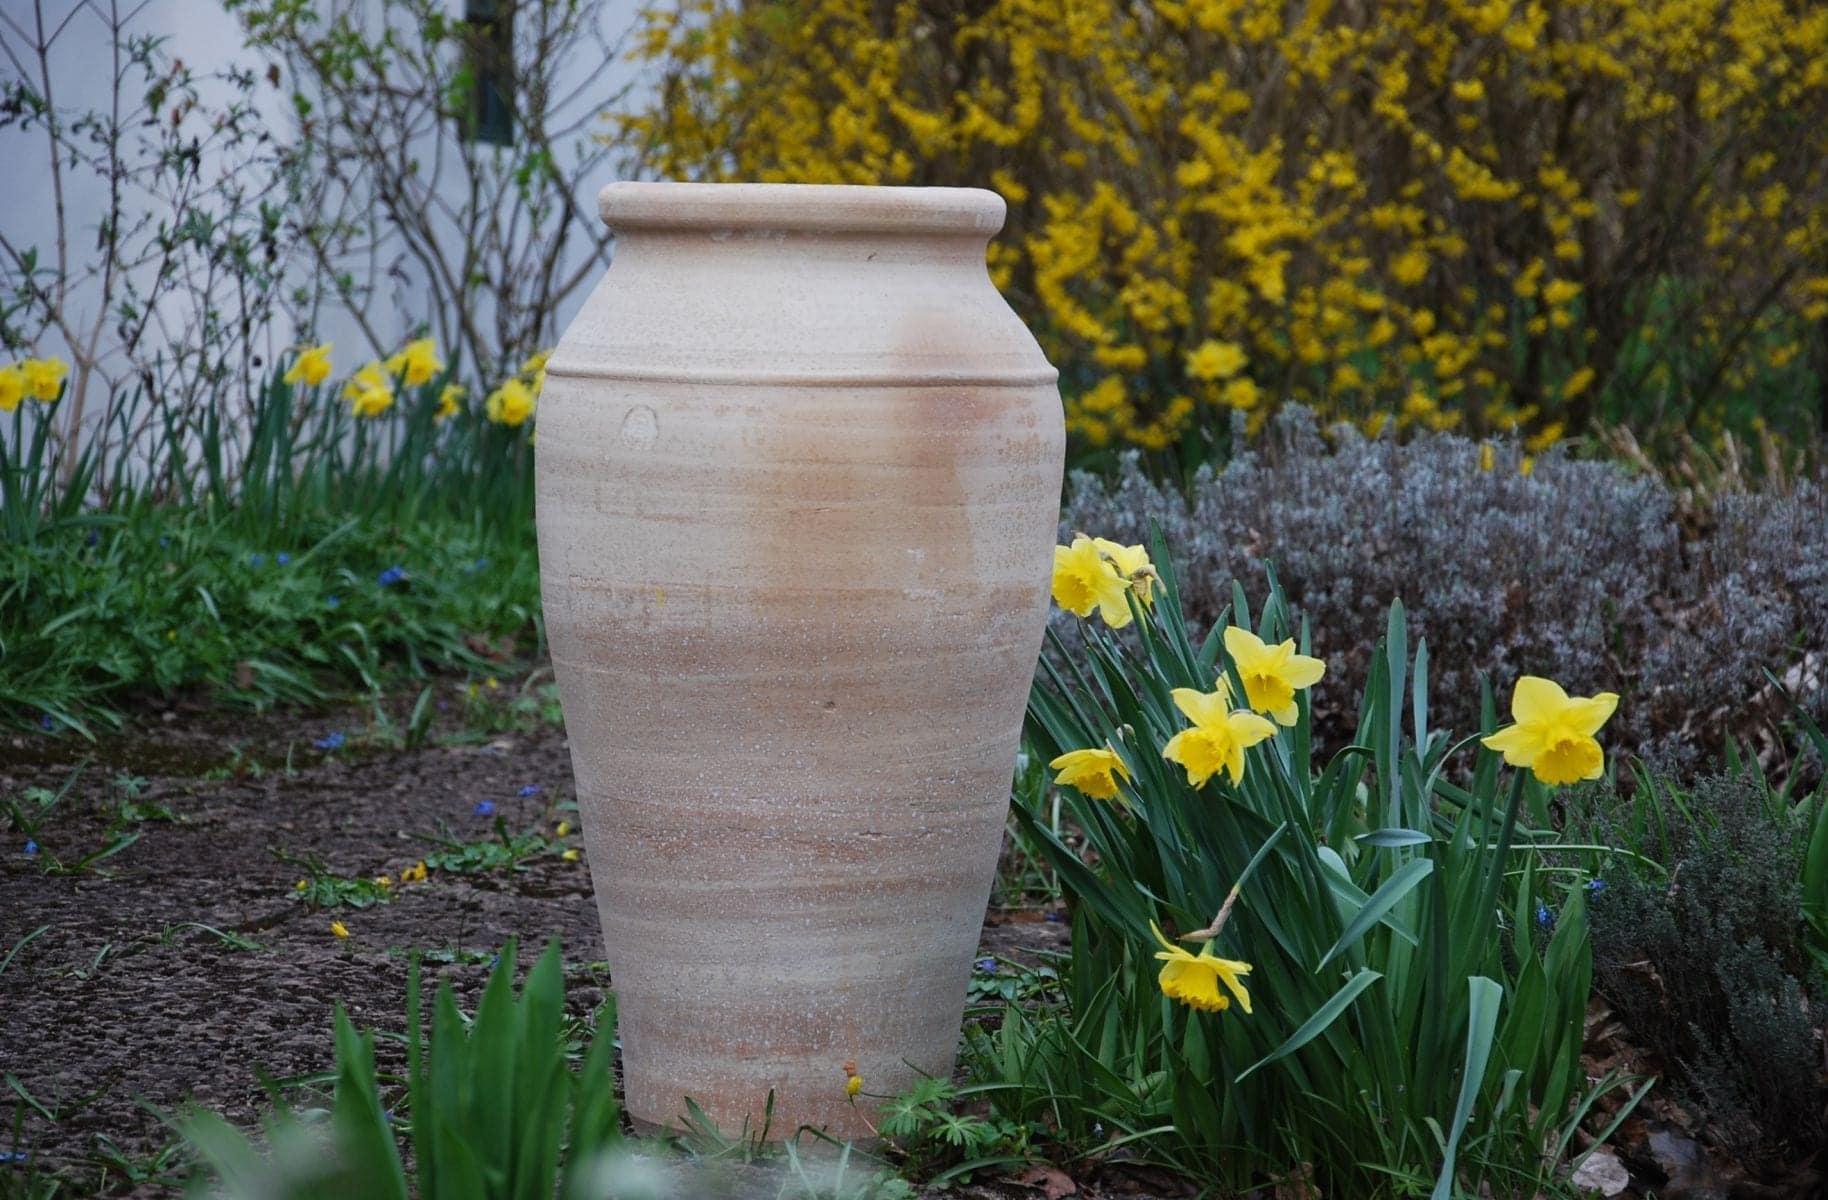 Bottle stor urna i frosttålig terrakotta från Medelhavet och Kreta